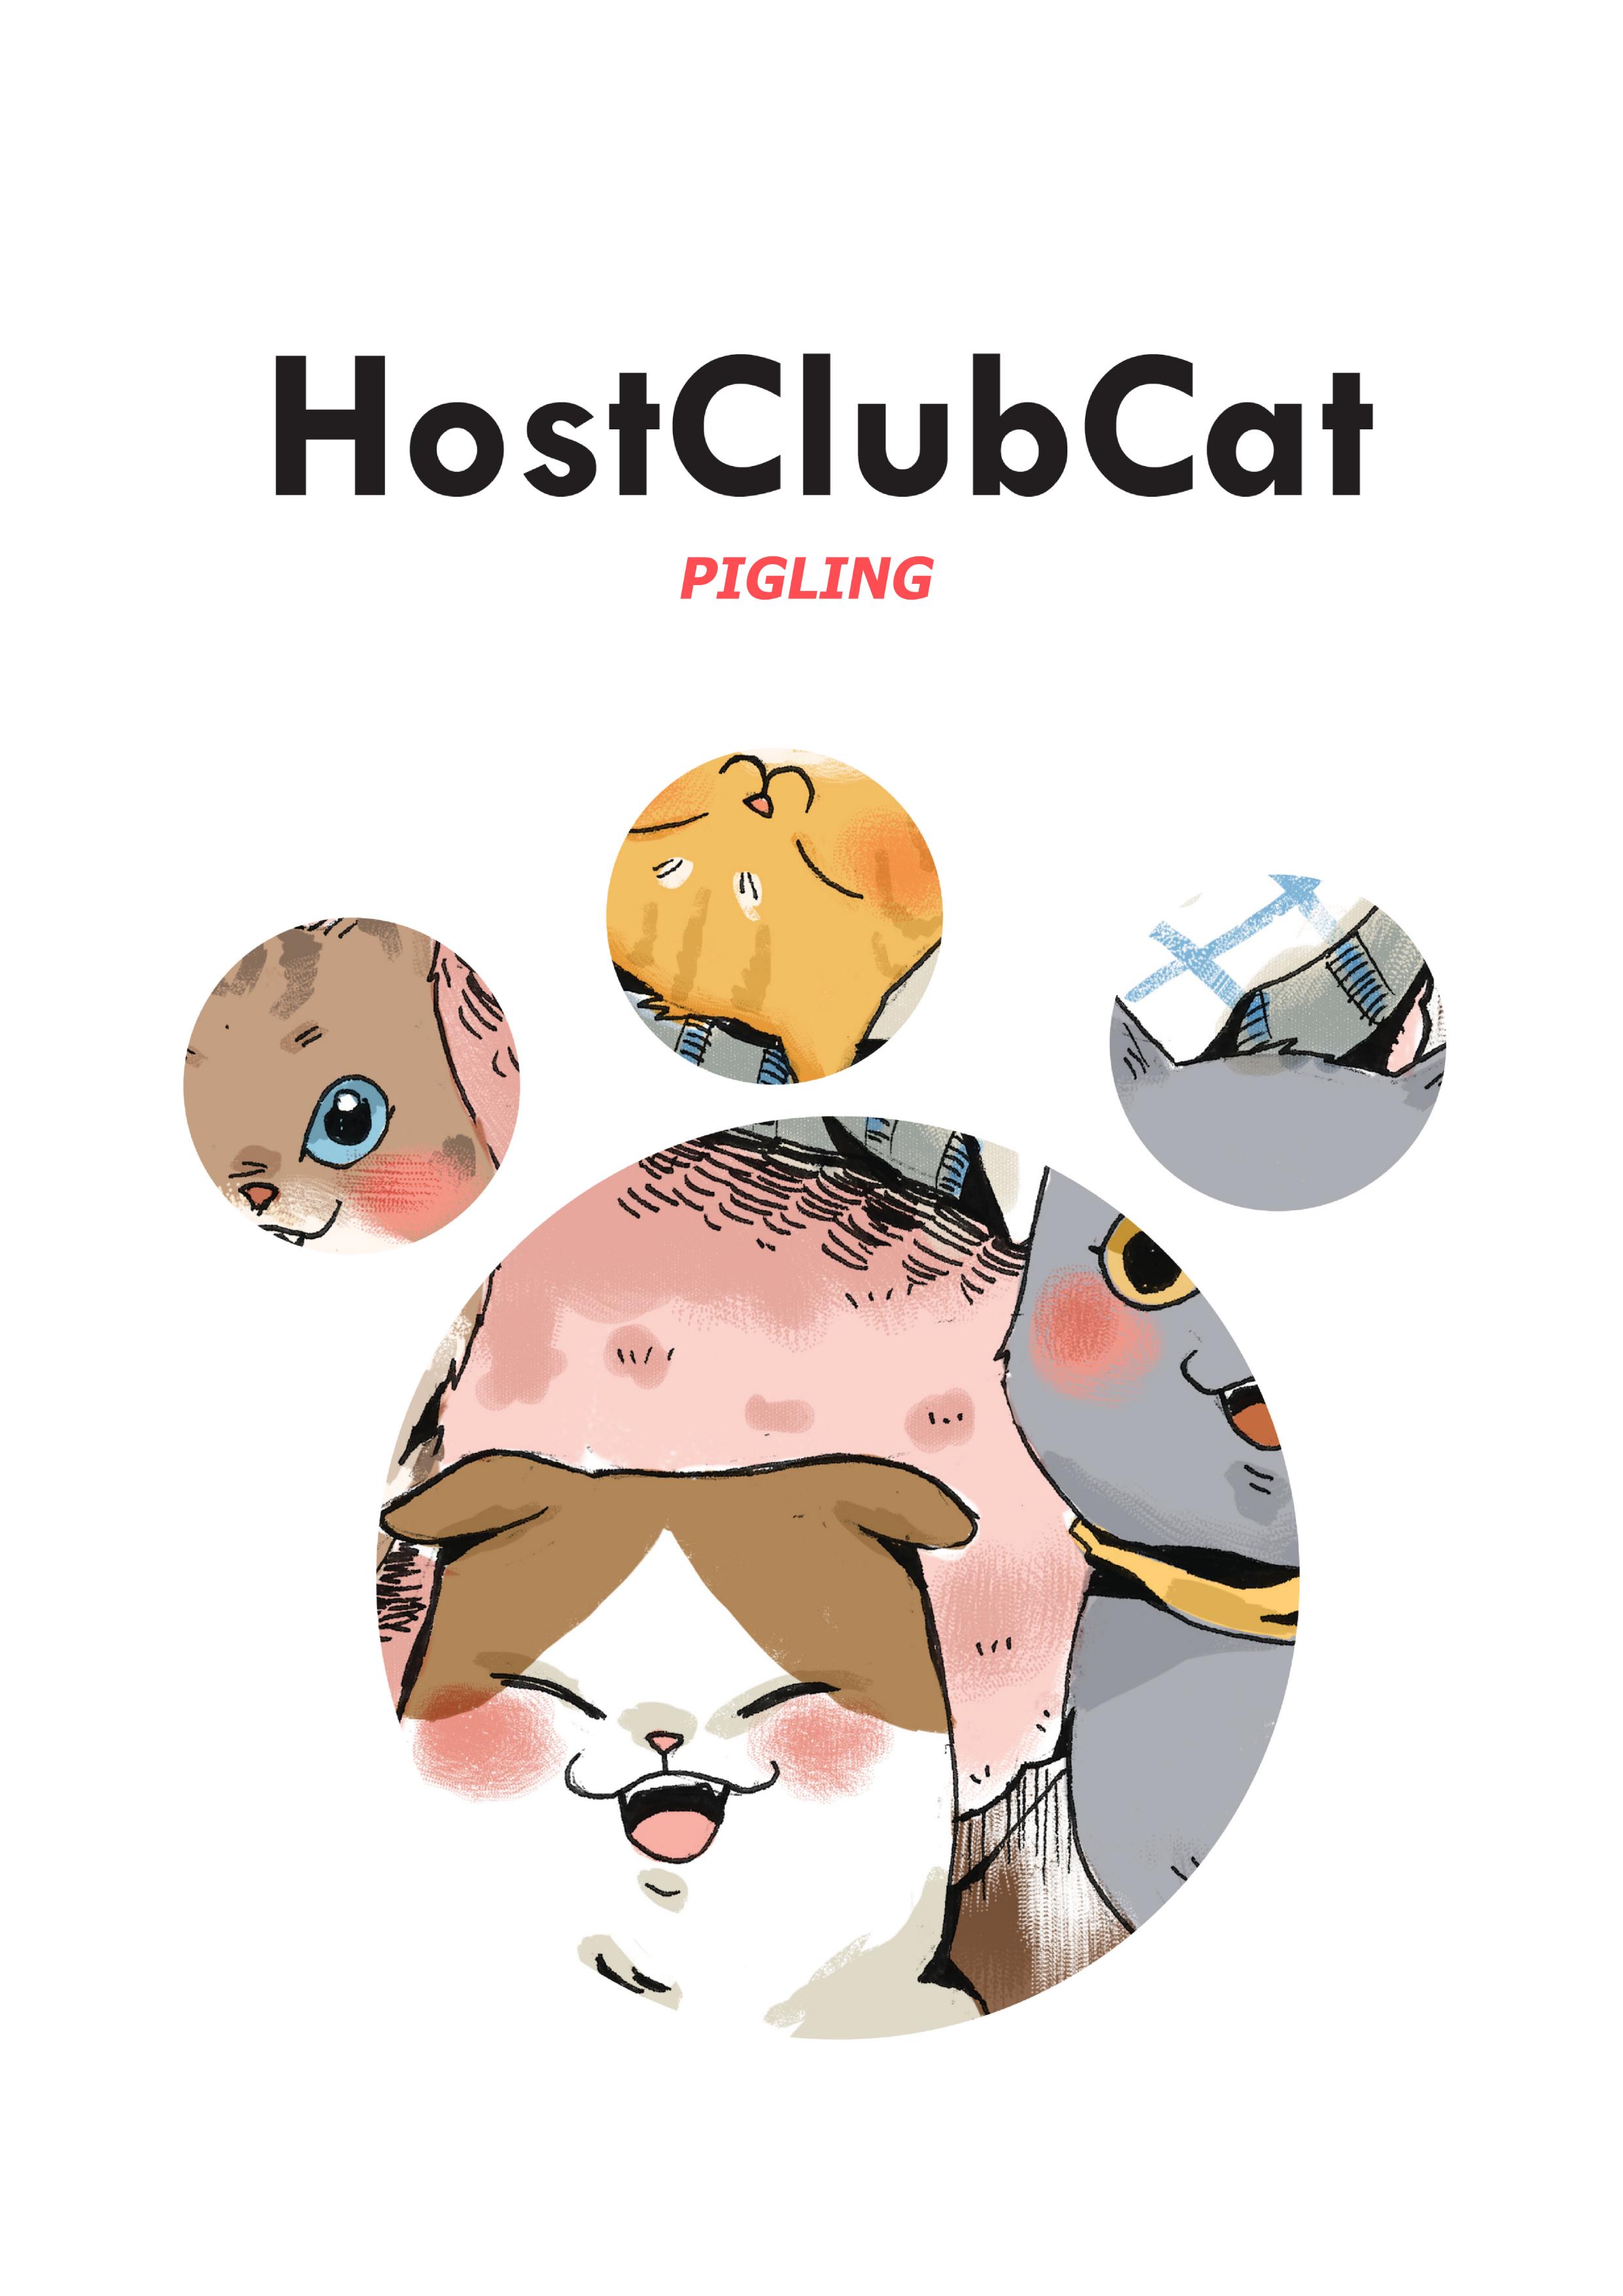 Host Club Cat (อ่านจากซ้ายไปขวา)